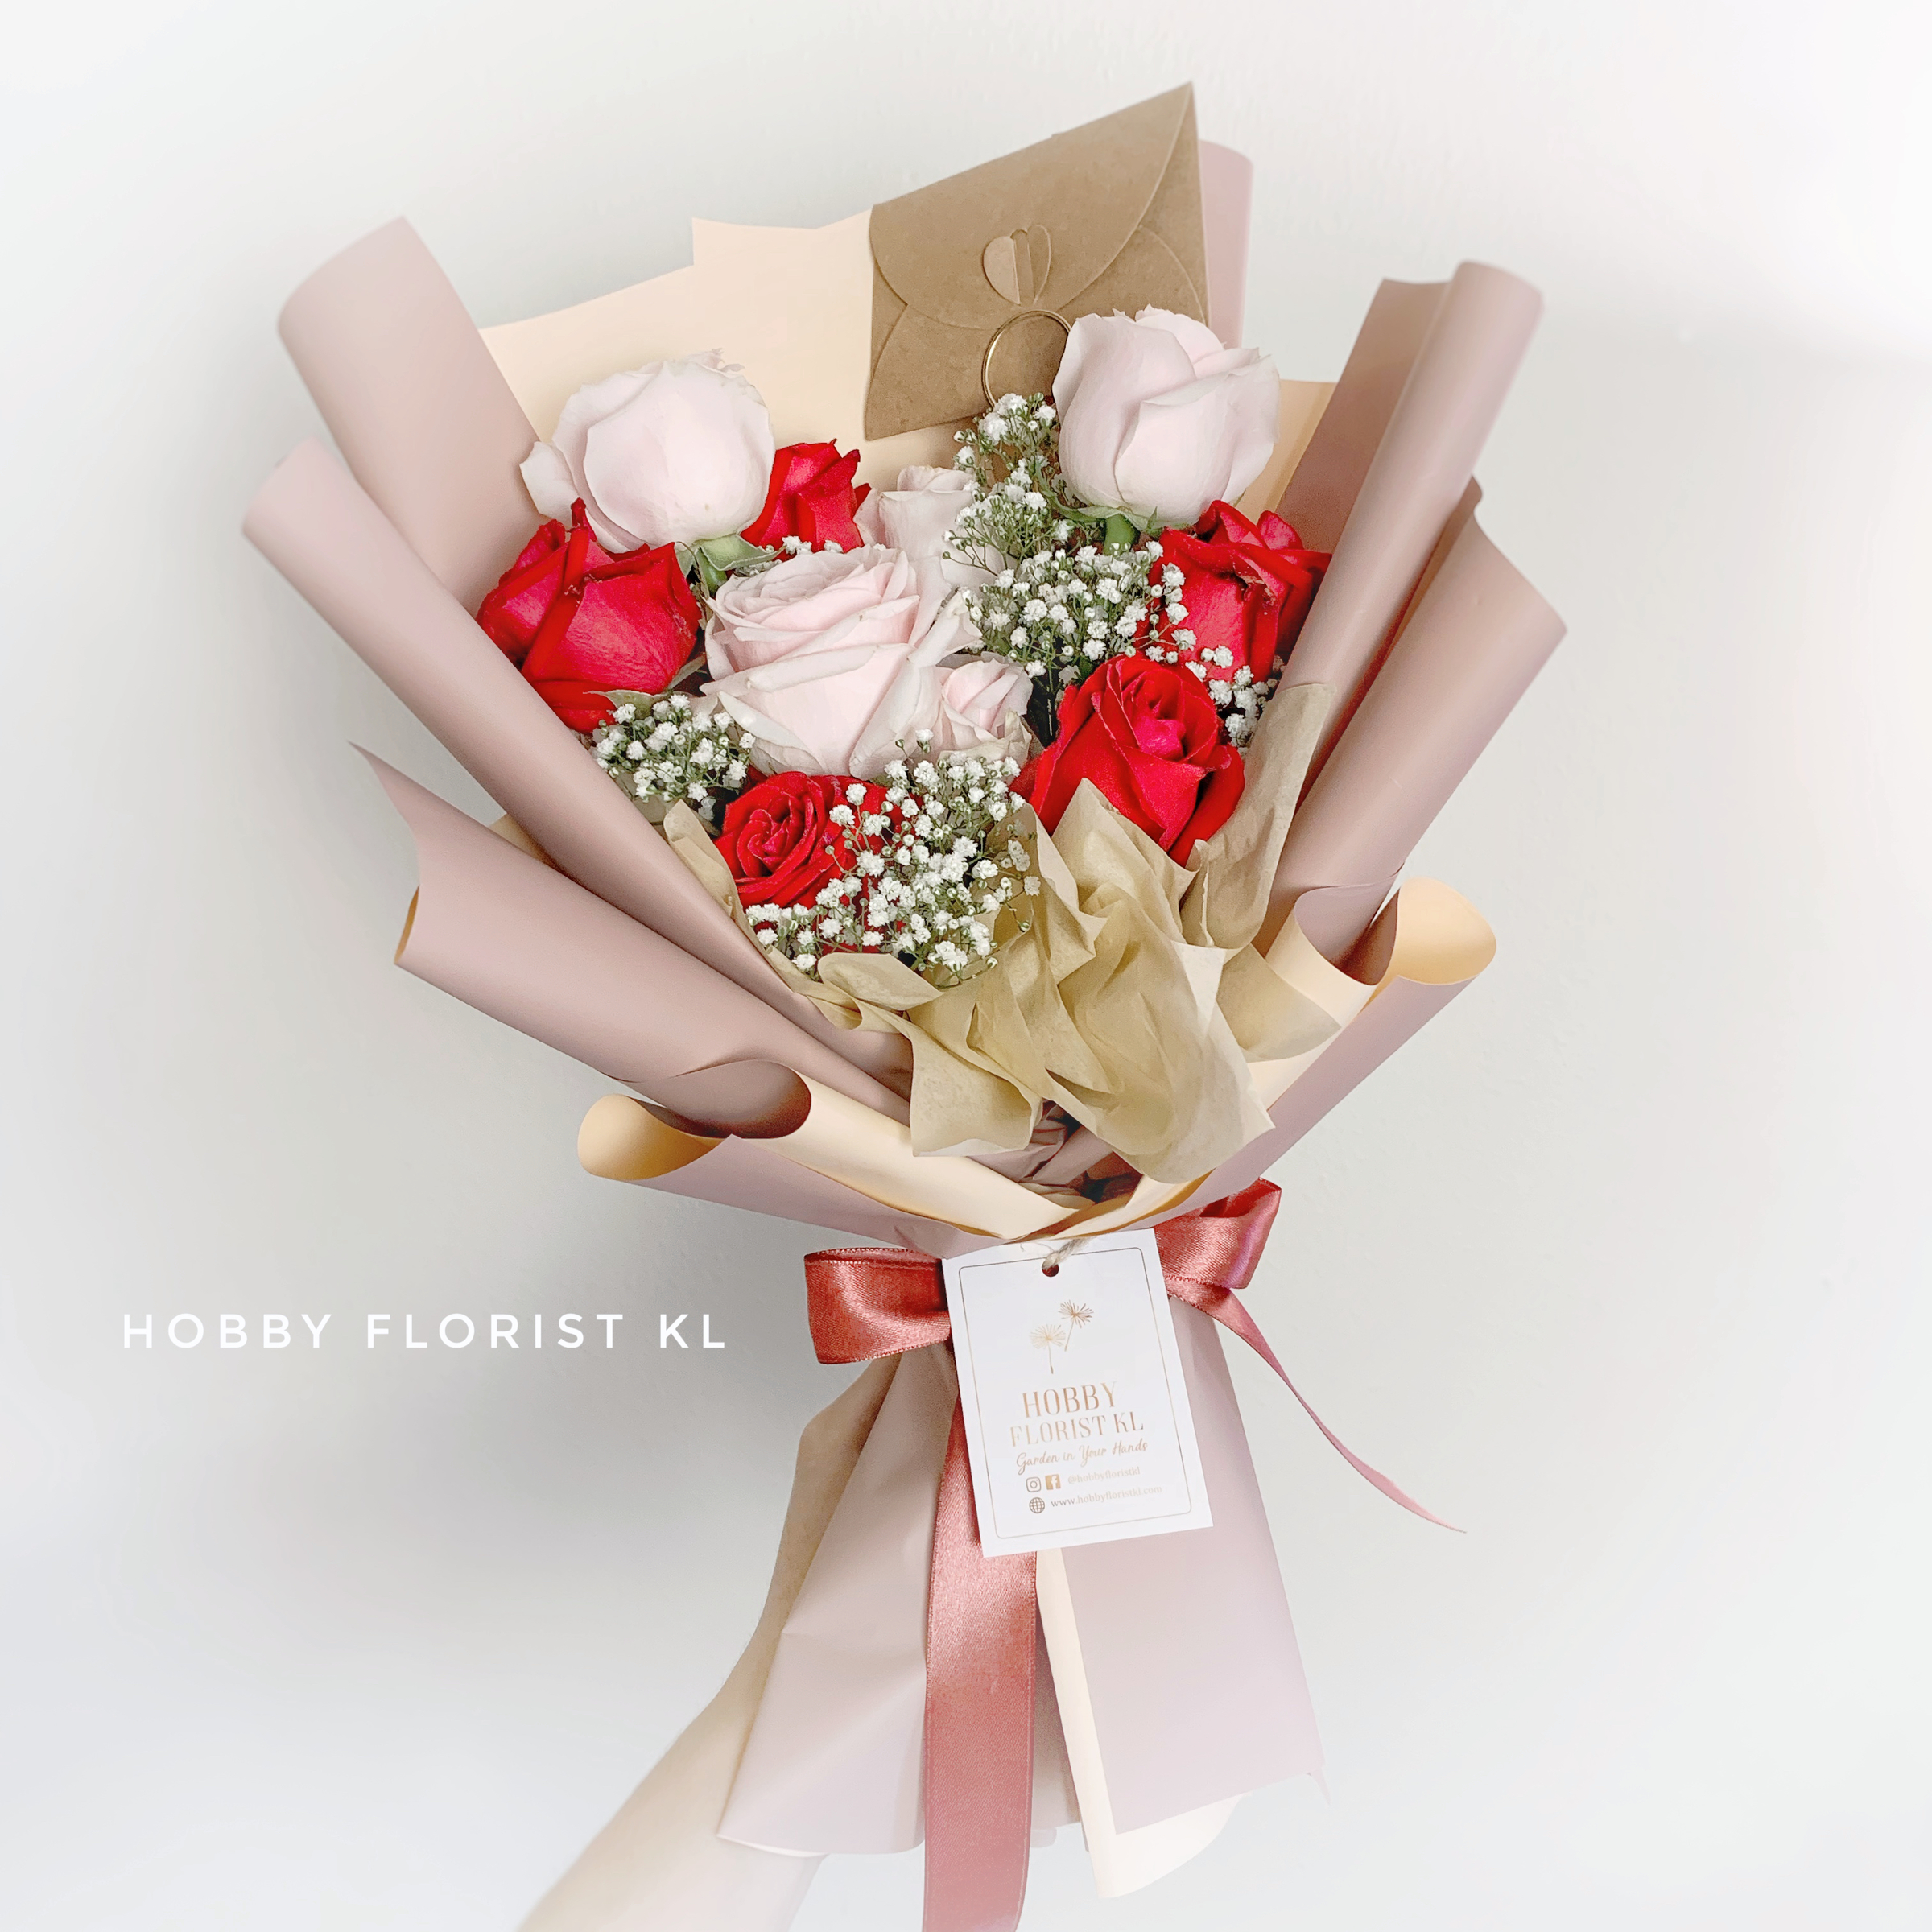 flower delivery kl 20a.JPG